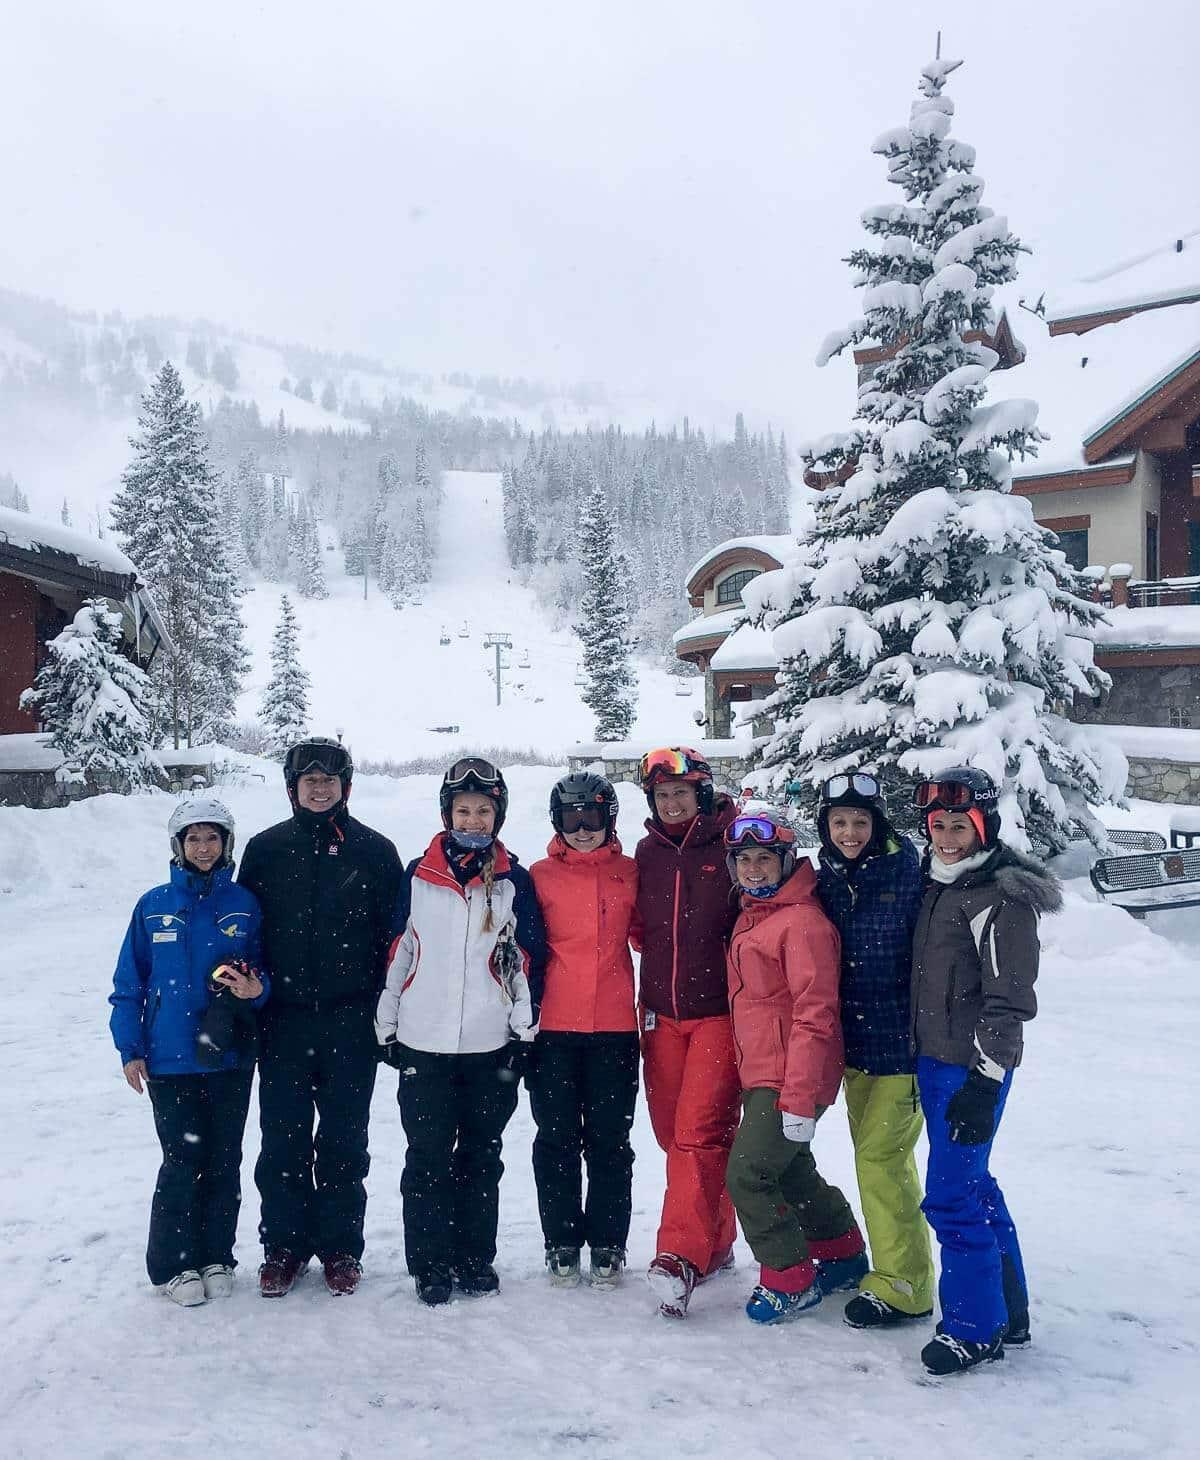 Ski group at Solitude